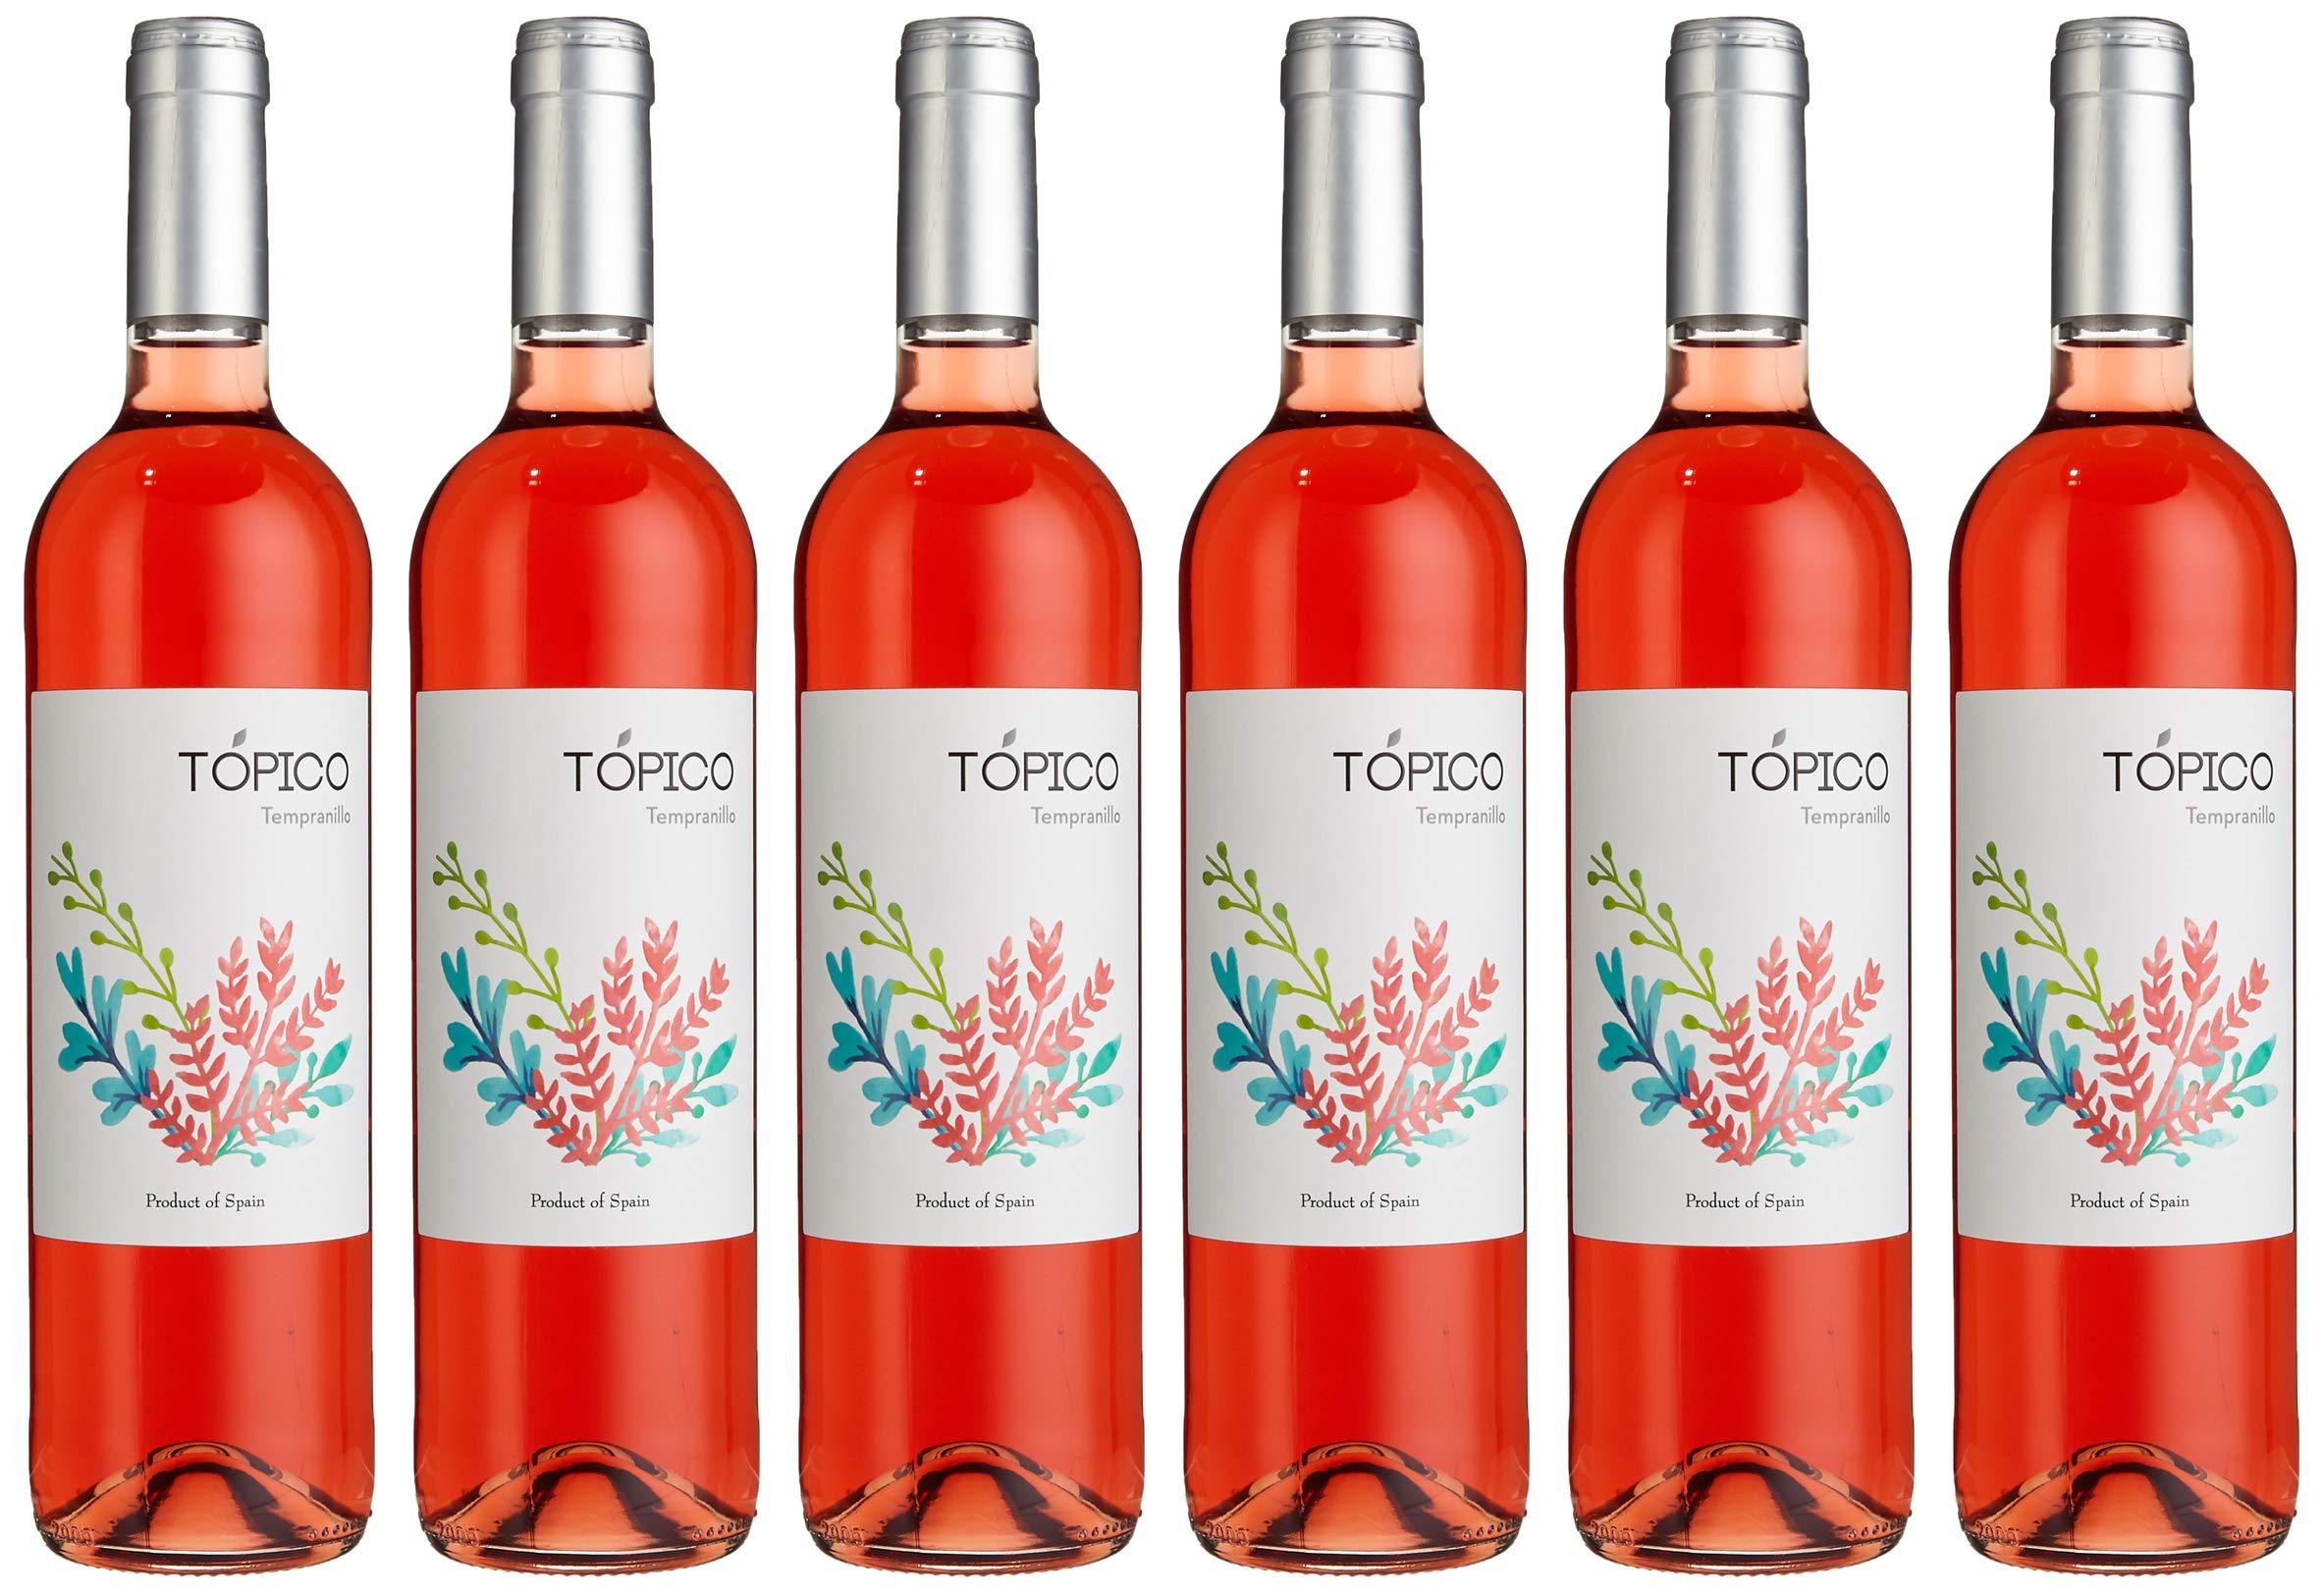 La-Remediadora-Topico-Rosado-Tempranillo-trocken-6-x-075-l